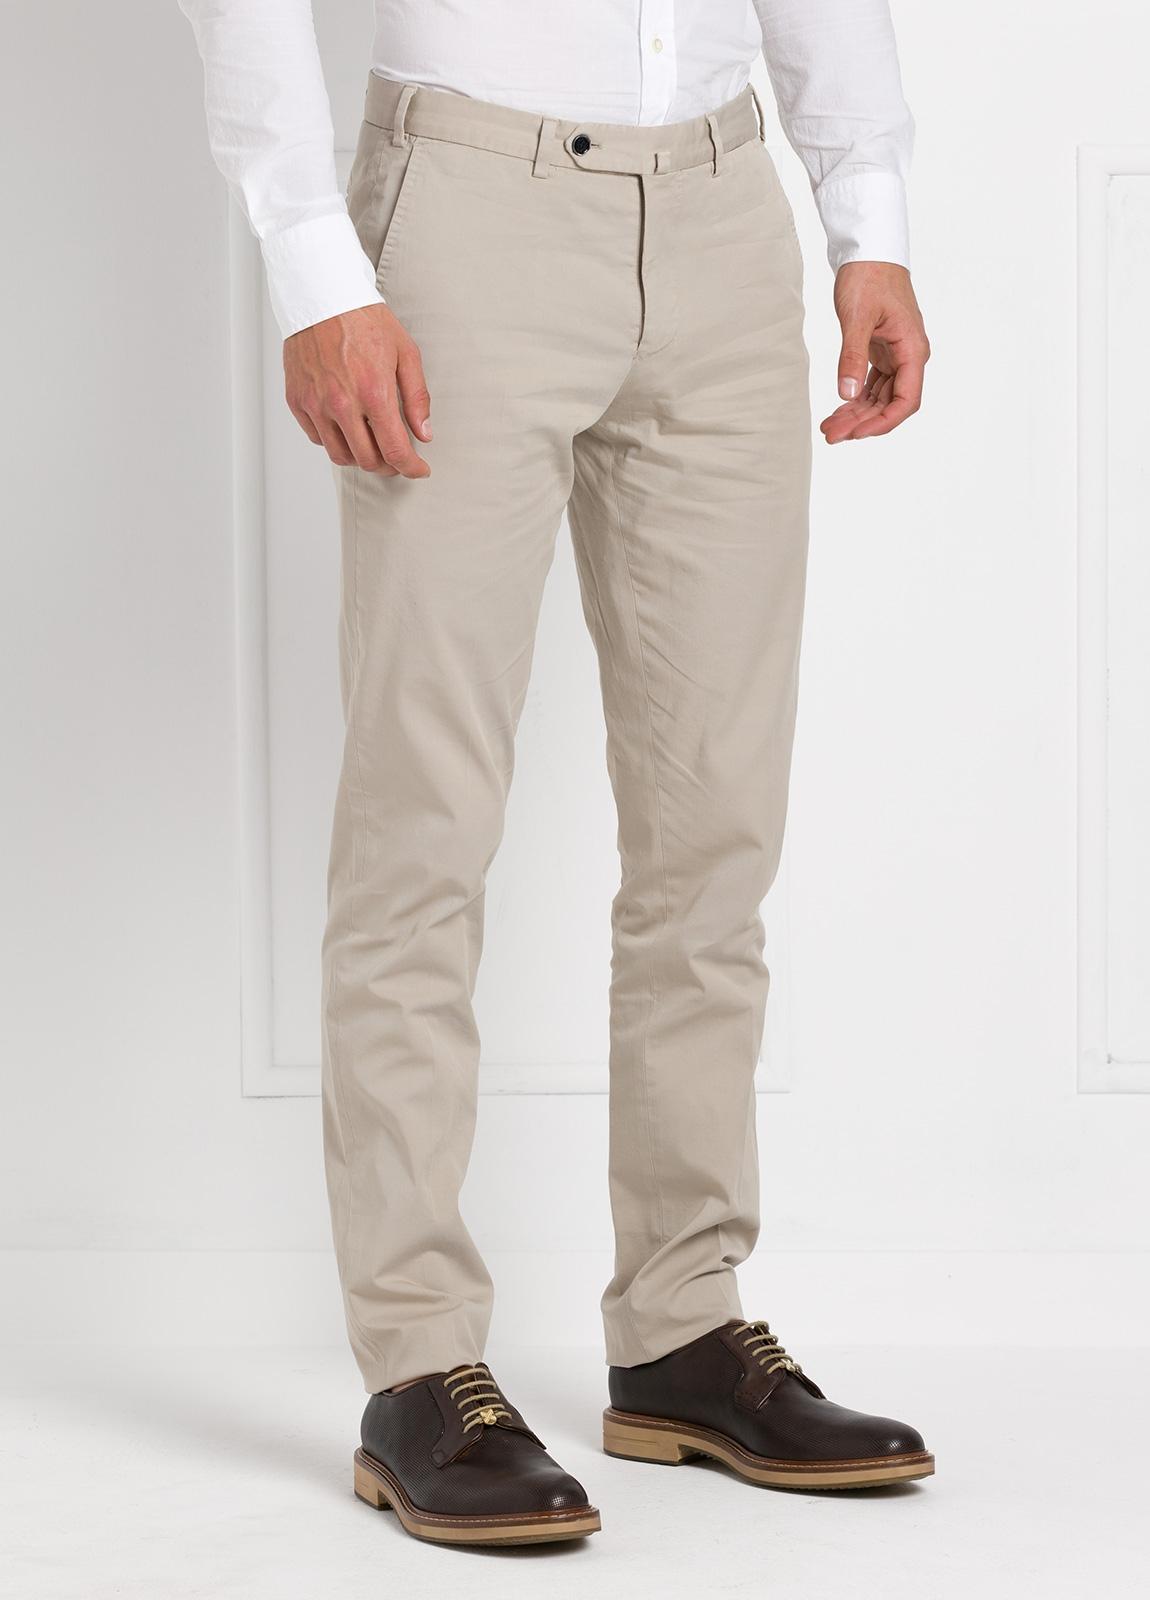 Pantalón chino modelo SANTA color beige. 97% Algodón 3% Elastán. - Ítem2